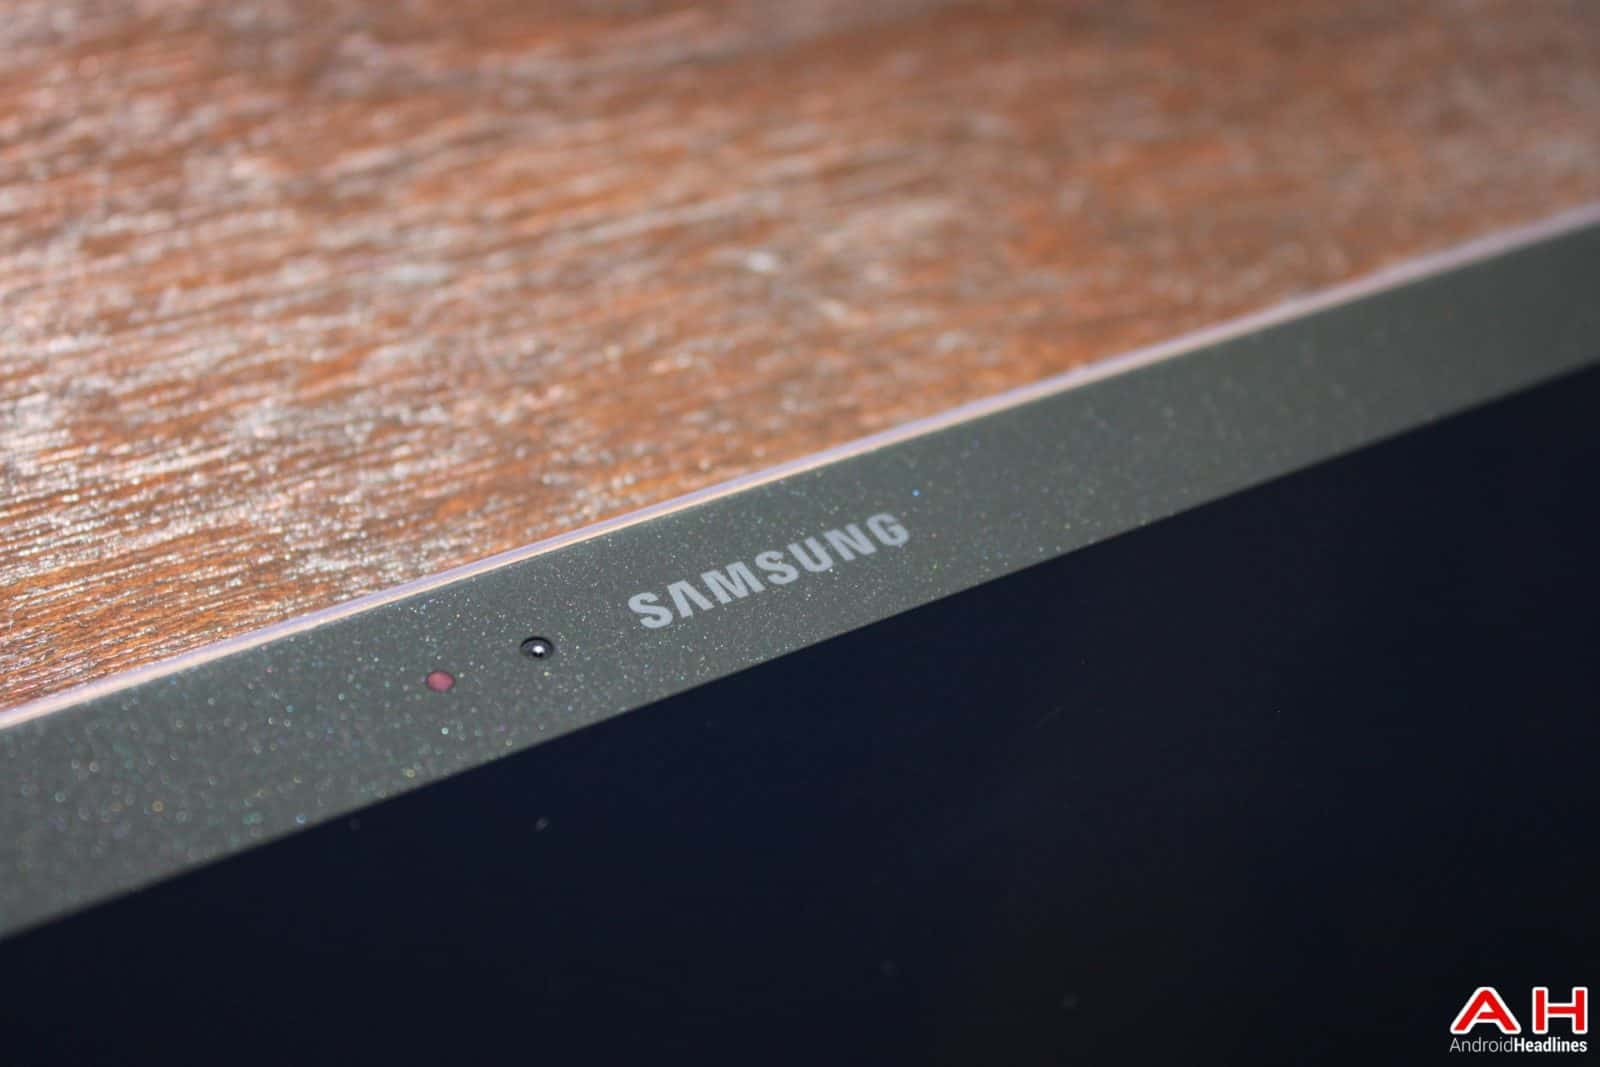 AH Samsung Logo Note 12.2 1.1